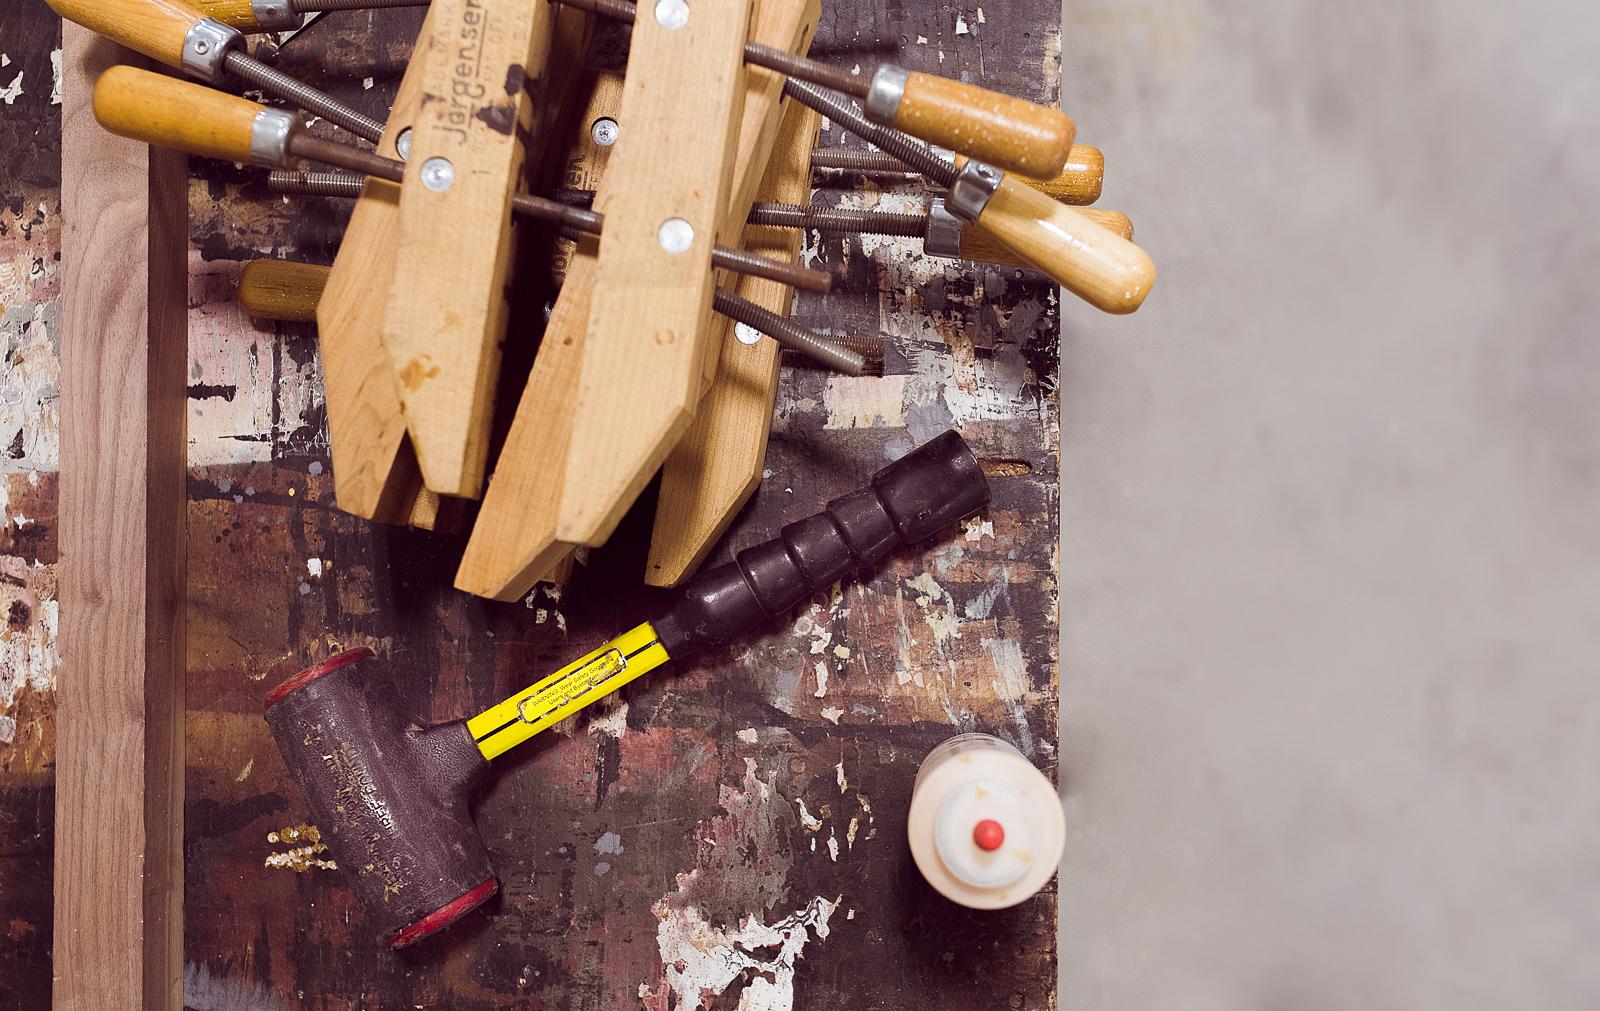 Woodworks-West-Bozeman-Montana-Builder-Cabinetry-Remodel-New-Construction-4196-Edit.jpg